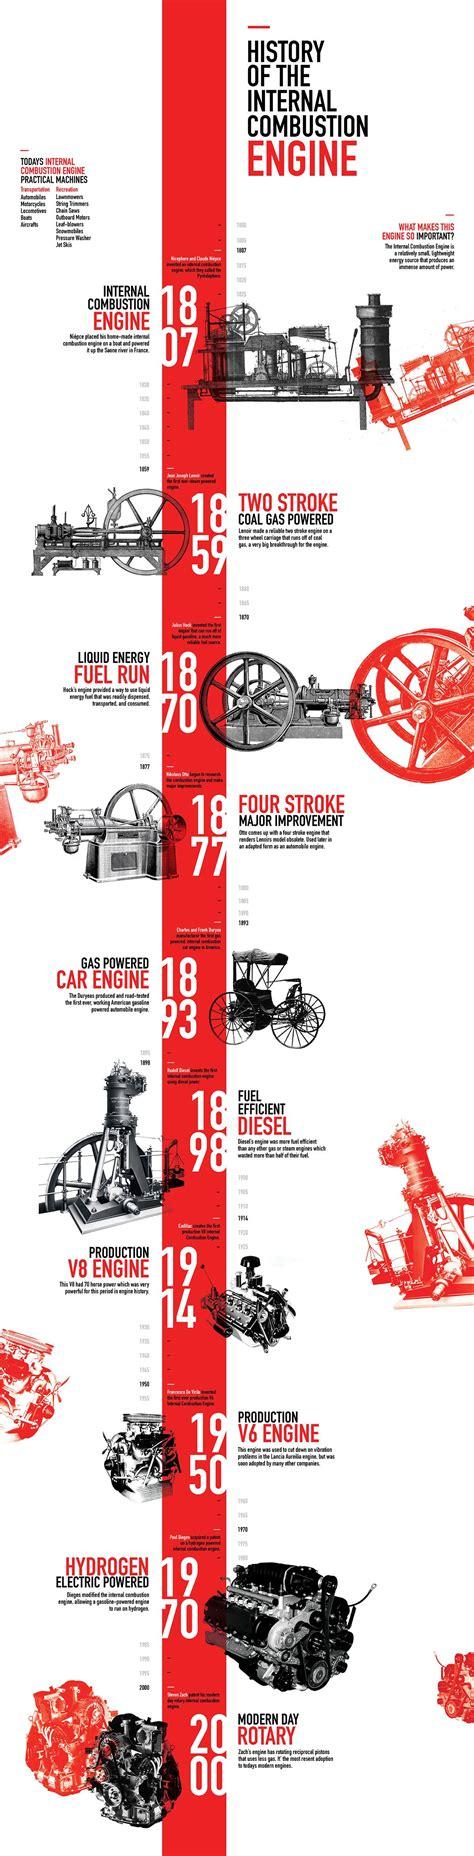 new pinterest layout problems timeline infographic timeline on behance inspiratie